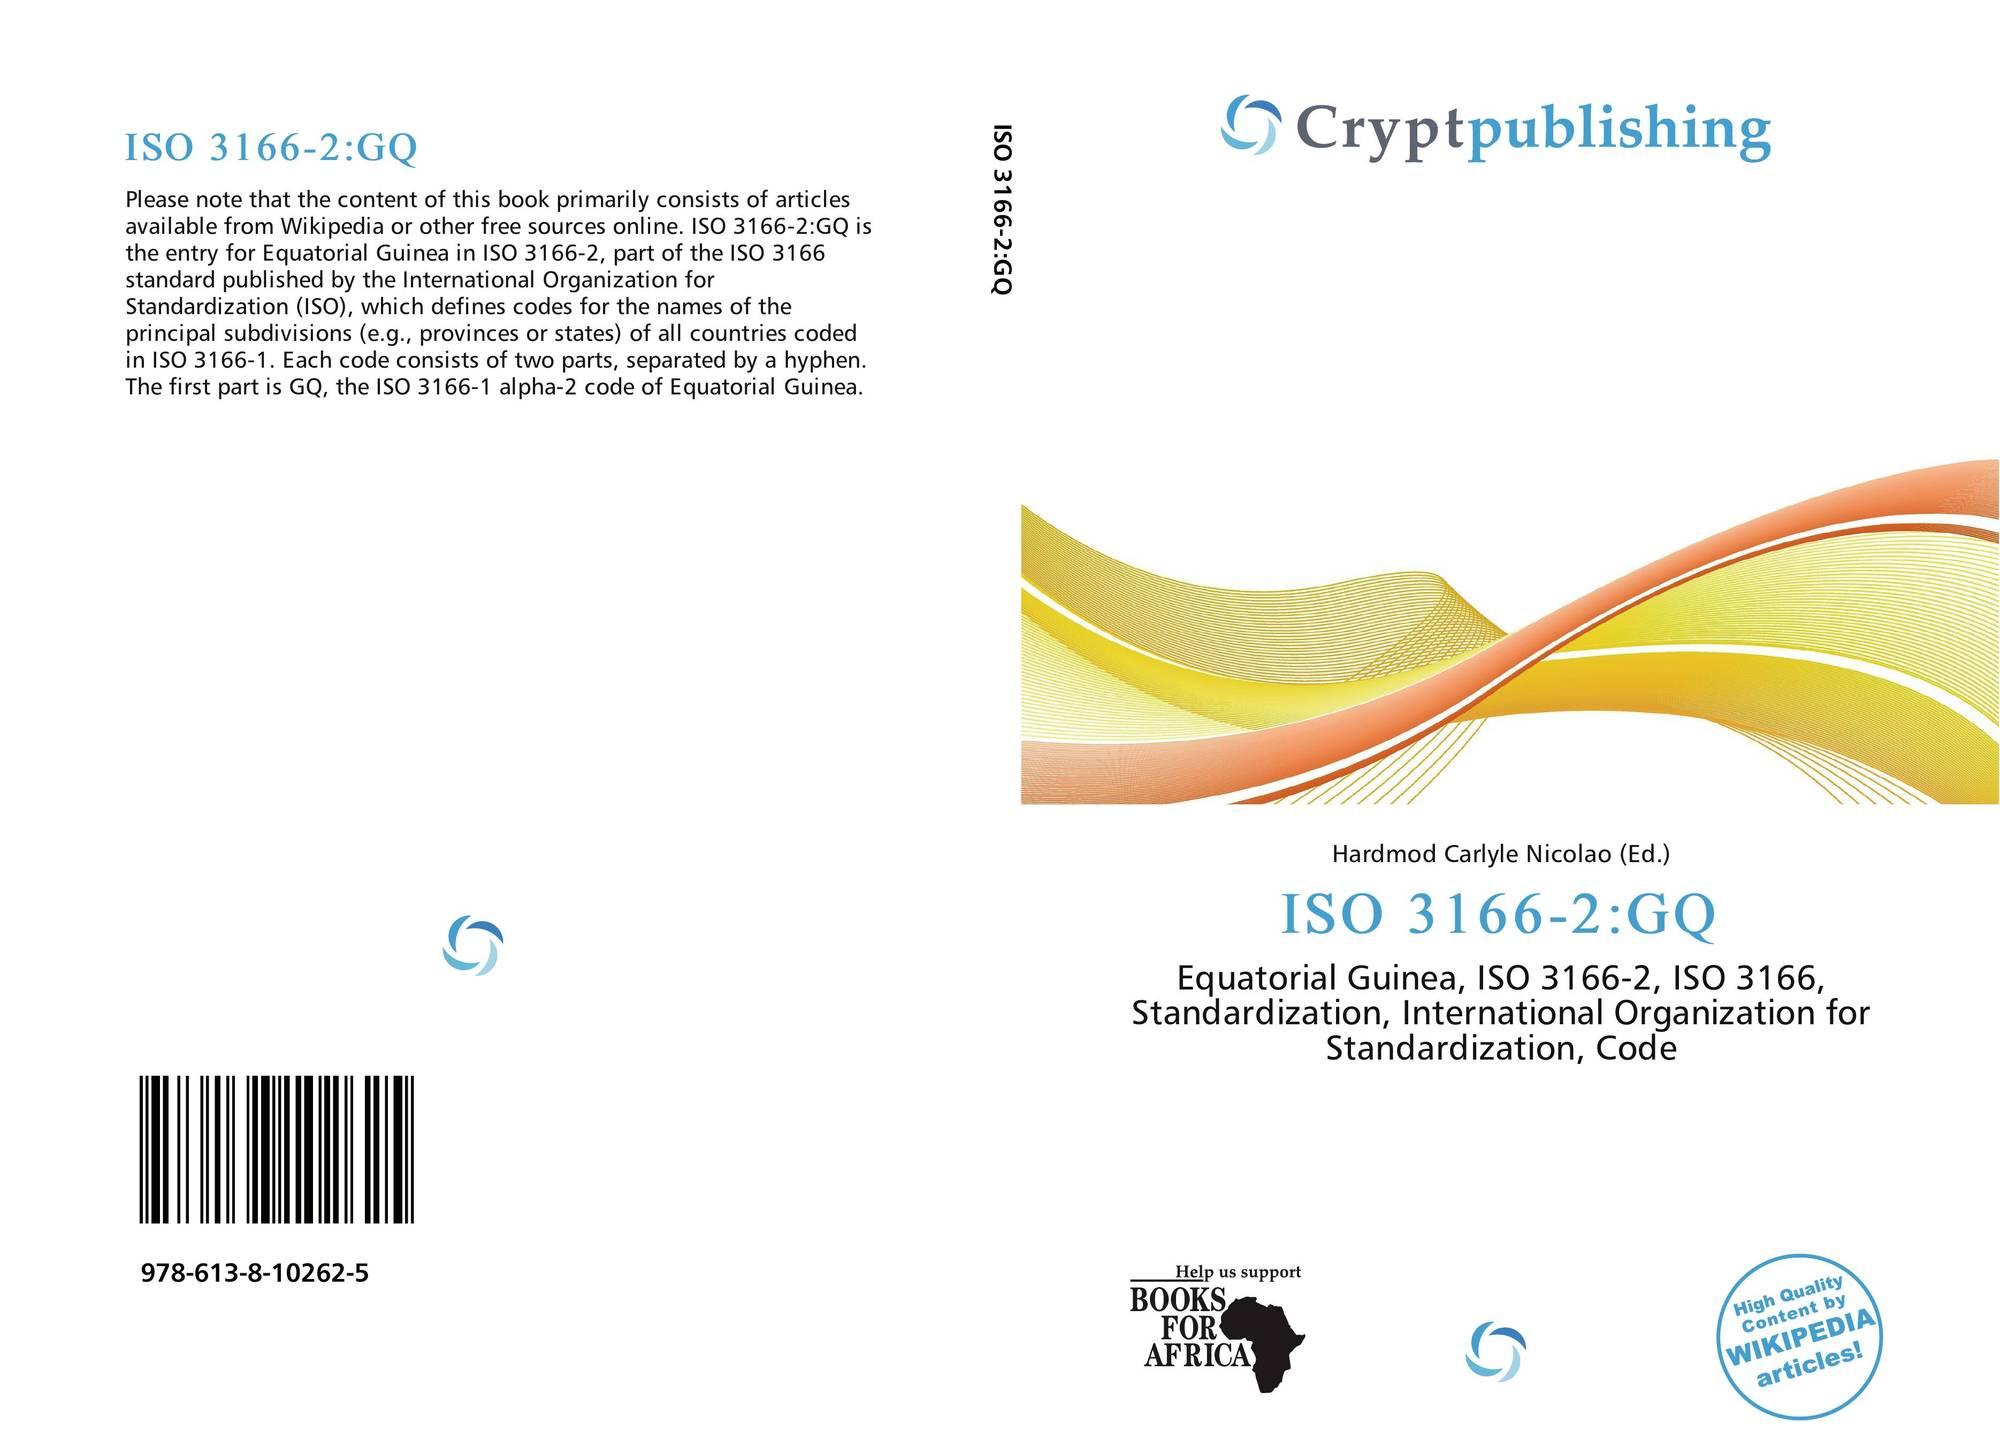 ISO 3166-2:GQ, 978-613-8-10262-5, 6138102622 ,9786138102625